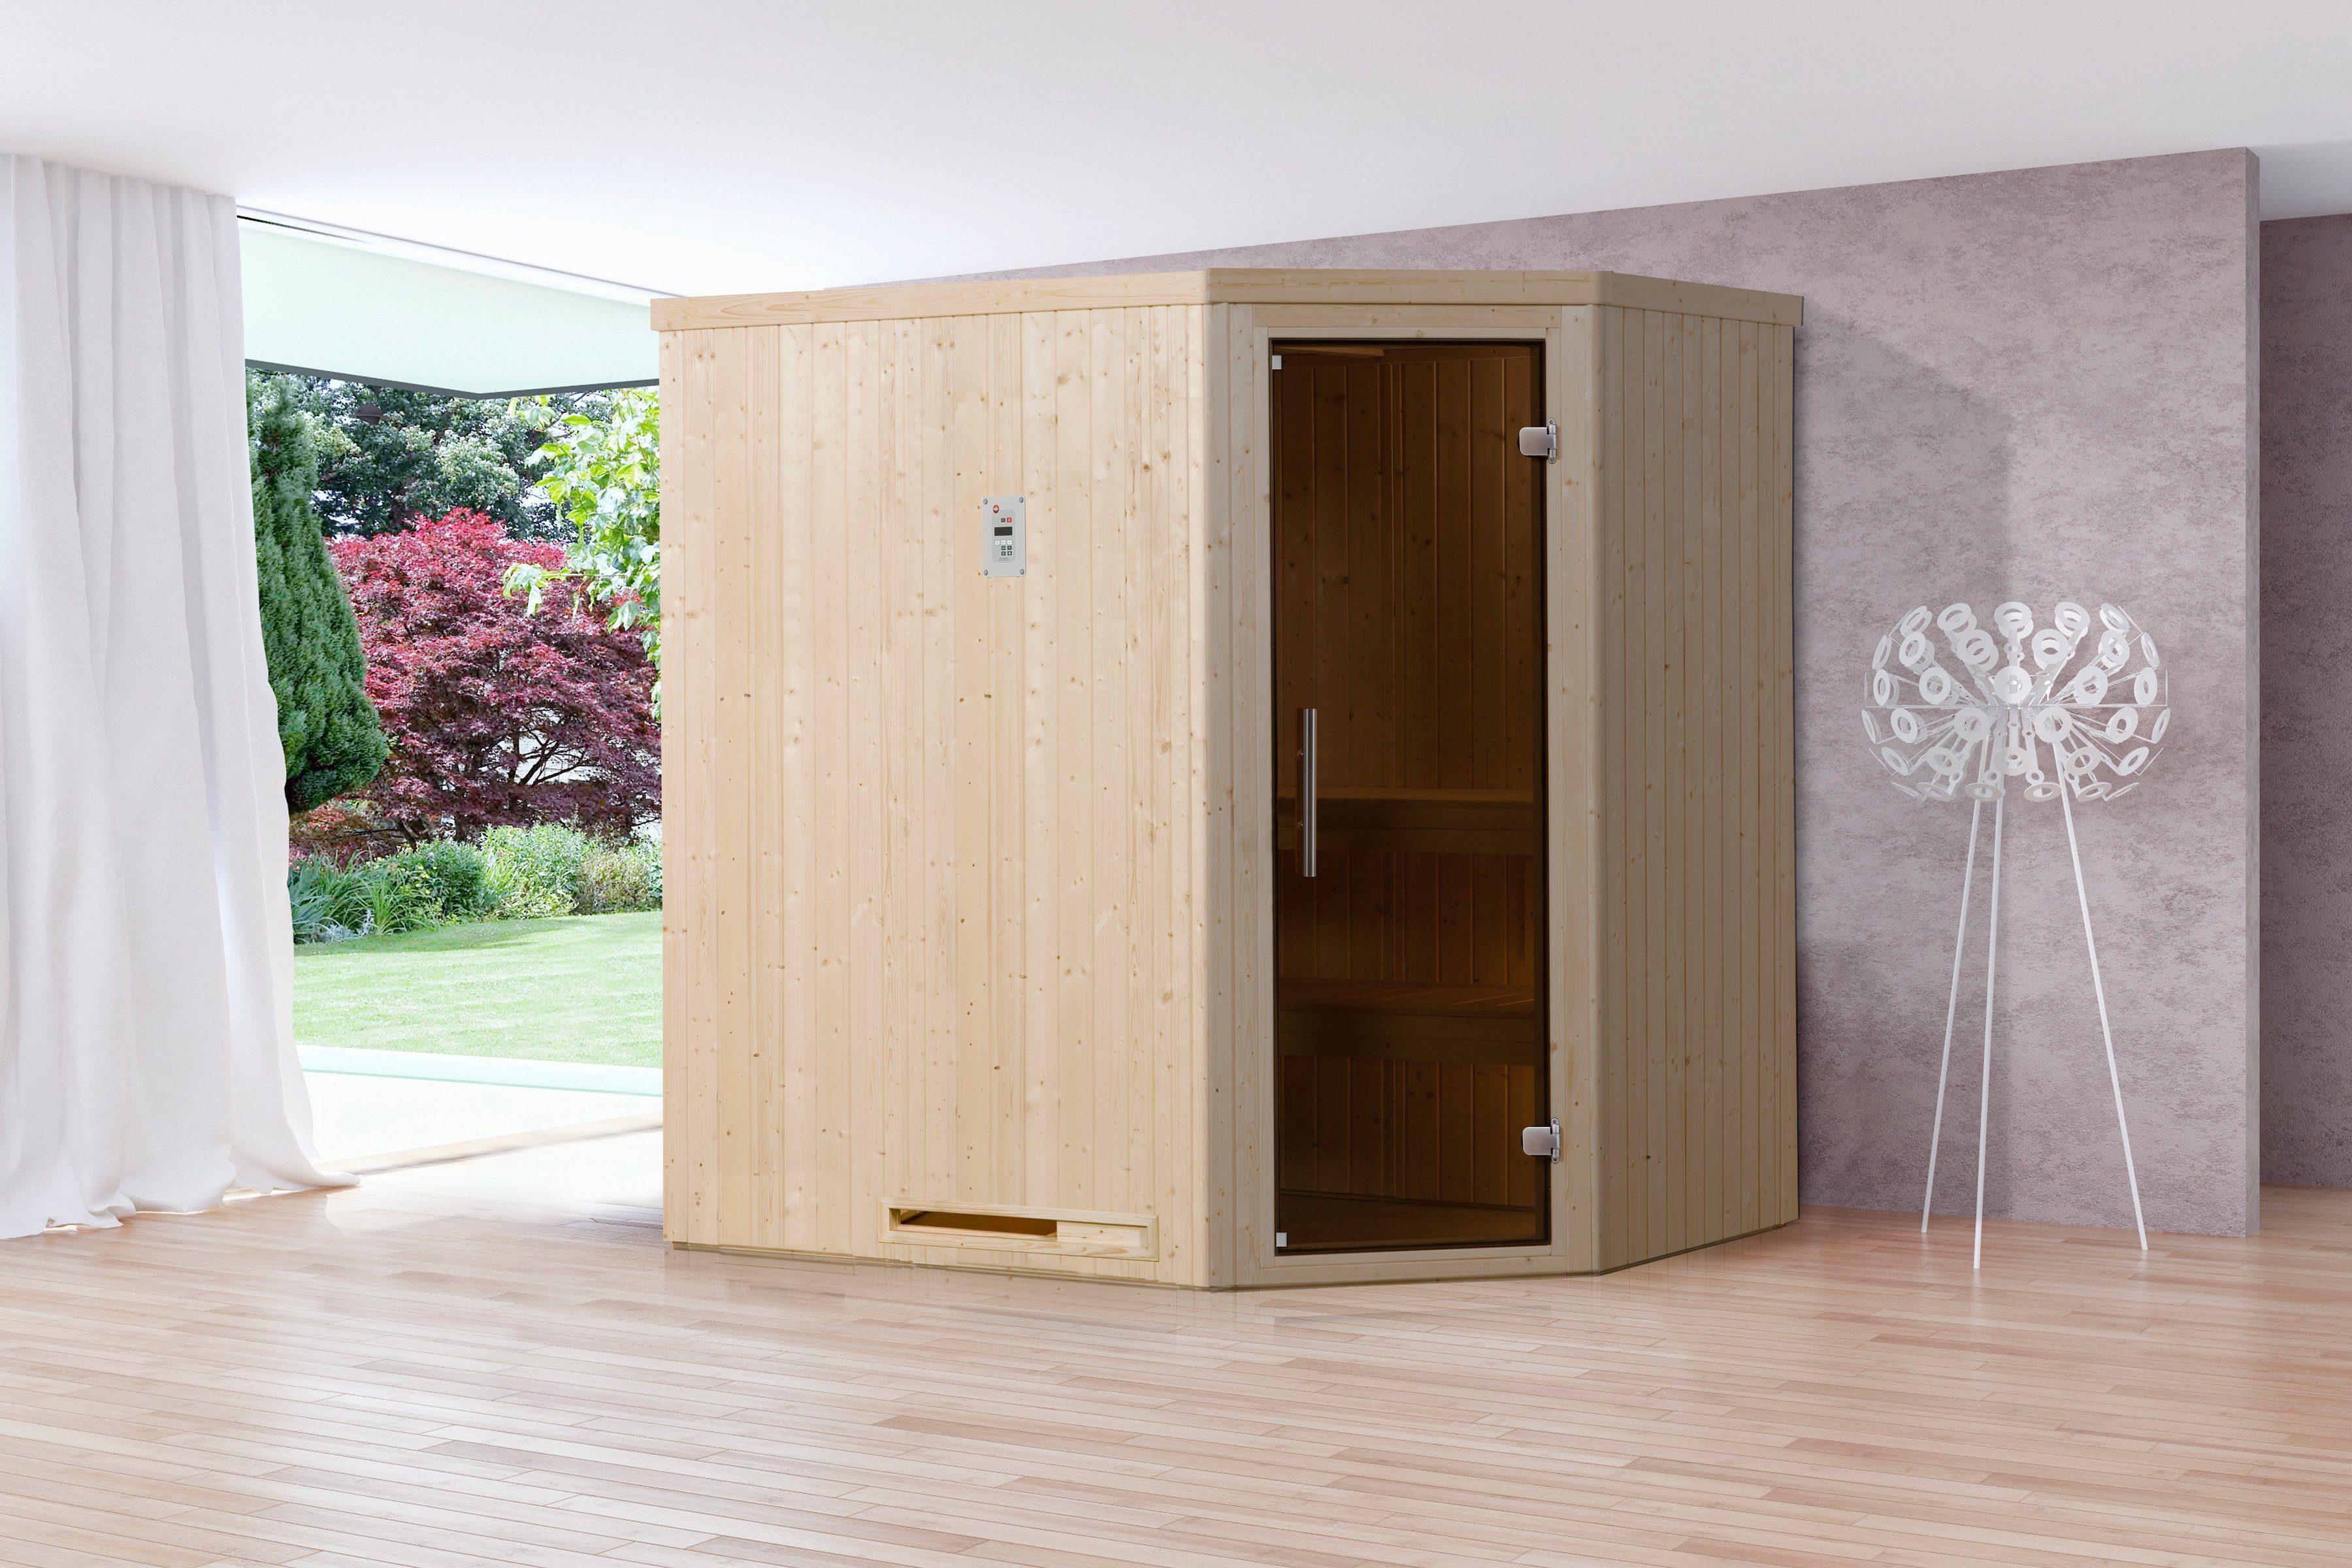 Sauna »Lyngdal 2 Trend BioS«, 192/141/199 cm, 68 mm, 7,5-KW-Ofen